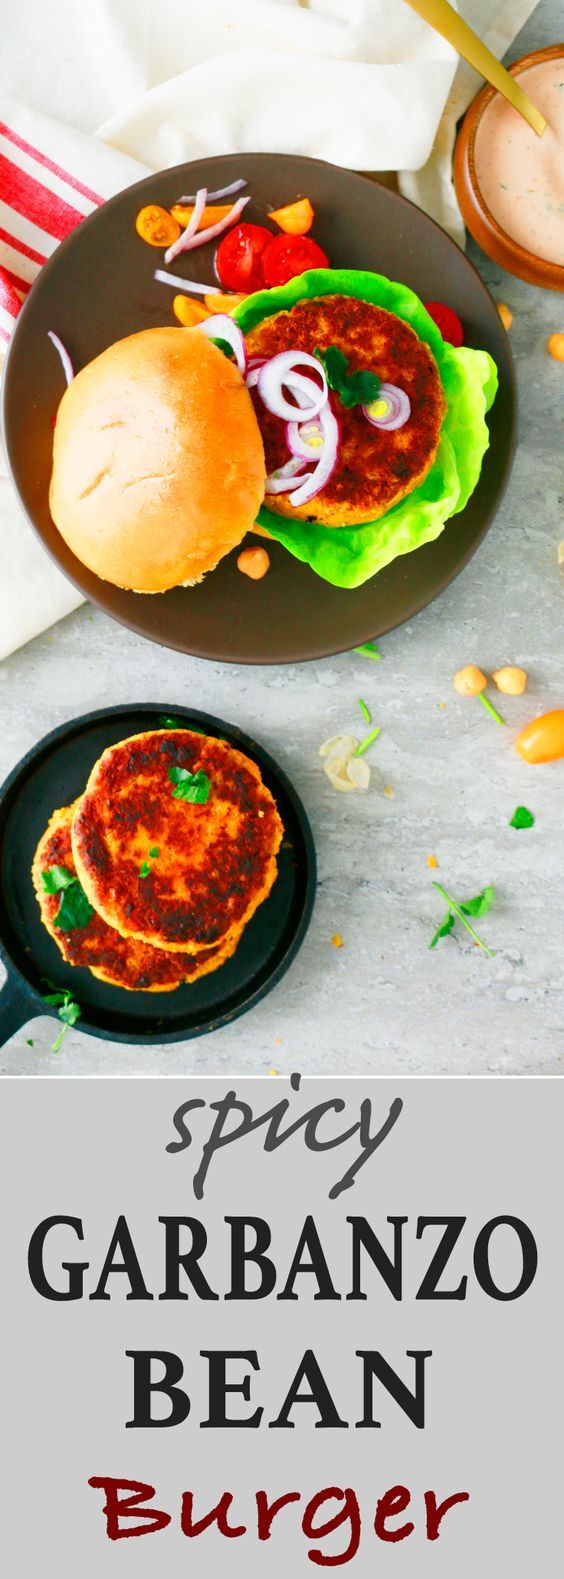 easy veggie burger recipe   garbanzo bean burger  baked garbanzo bean burger   spicy chickpea burger   garbanzo bean burger recipe   best chickpea burger recipe   best homemade veggie burger   chickpea burger recipe   meatless monday recipe   easy weeknight dinner recipes